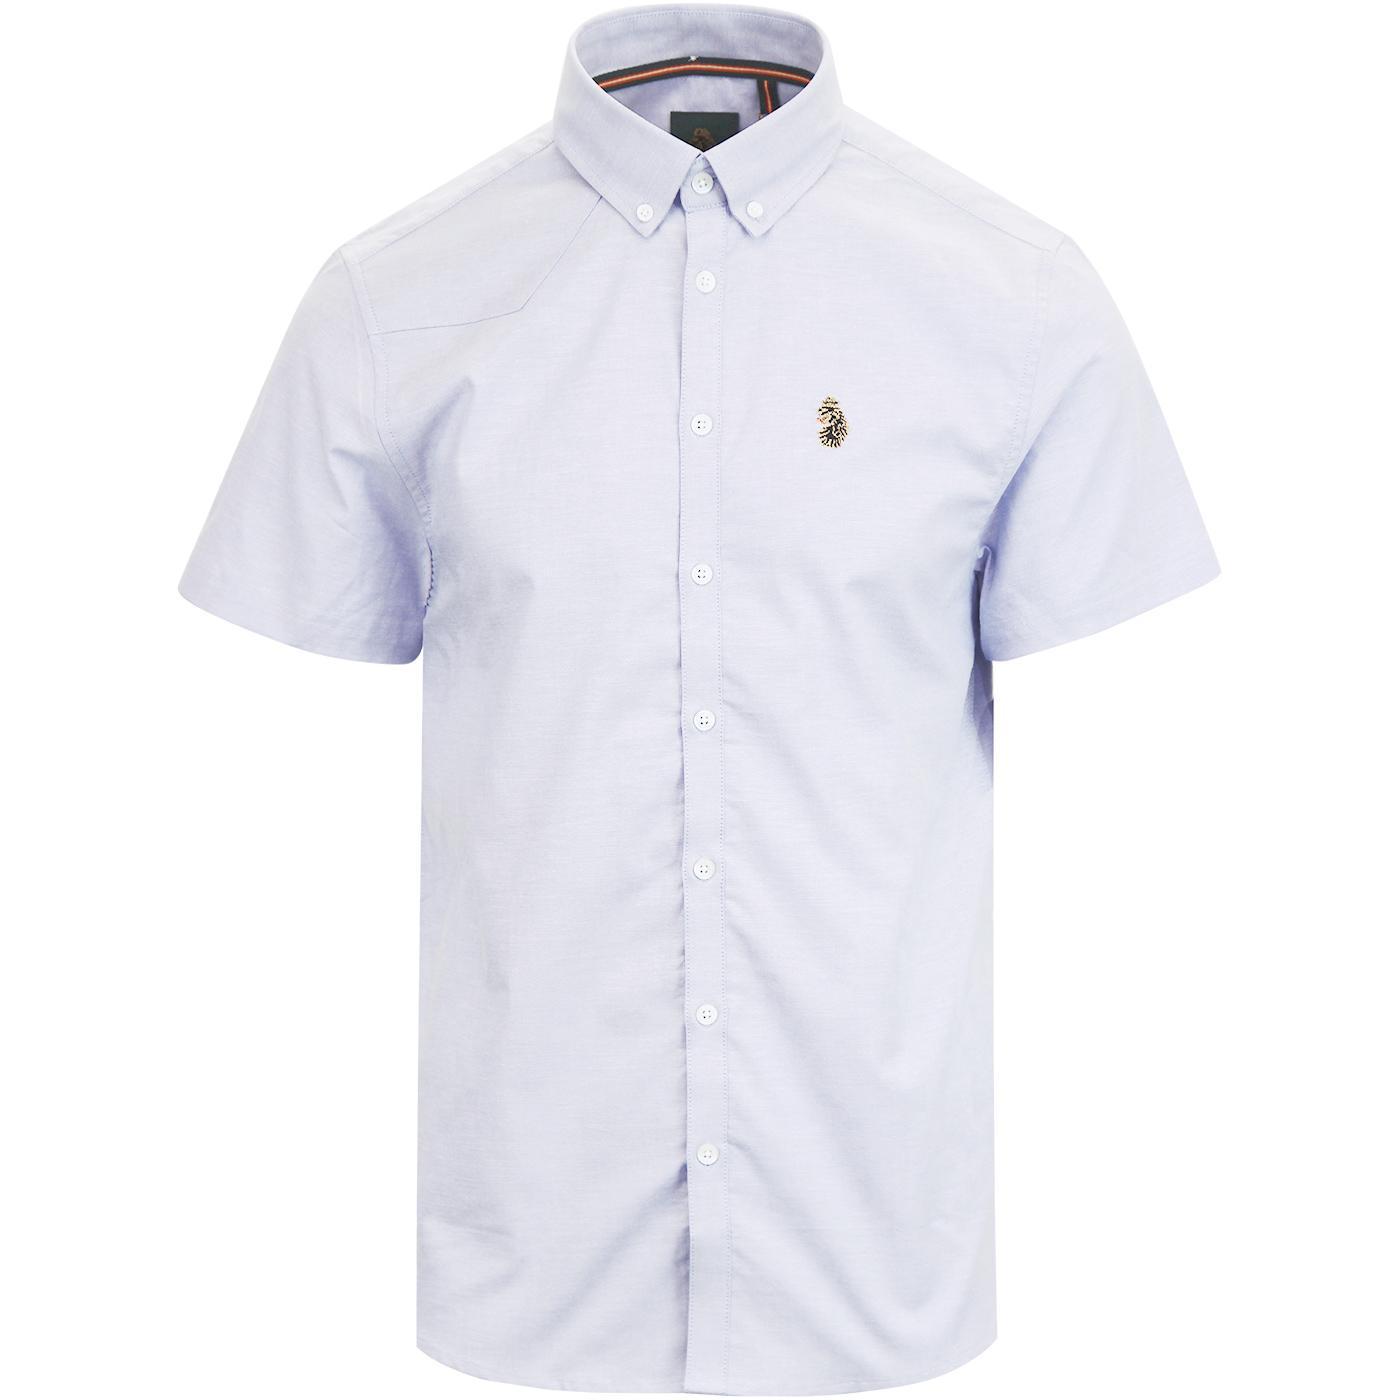 Jimmy Stretch LUKE Retro Slim Fit Oxford Shirt SKY